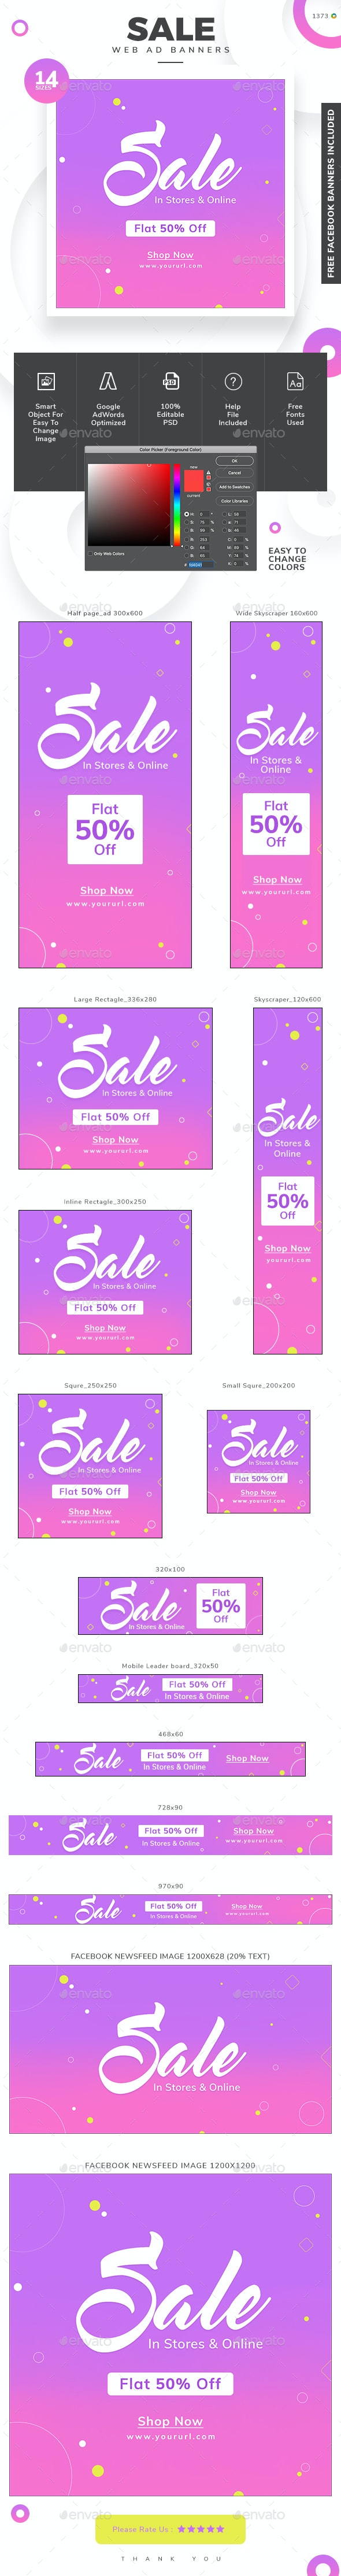 Sale Web Banner Set - Banners & Ads Web Elements